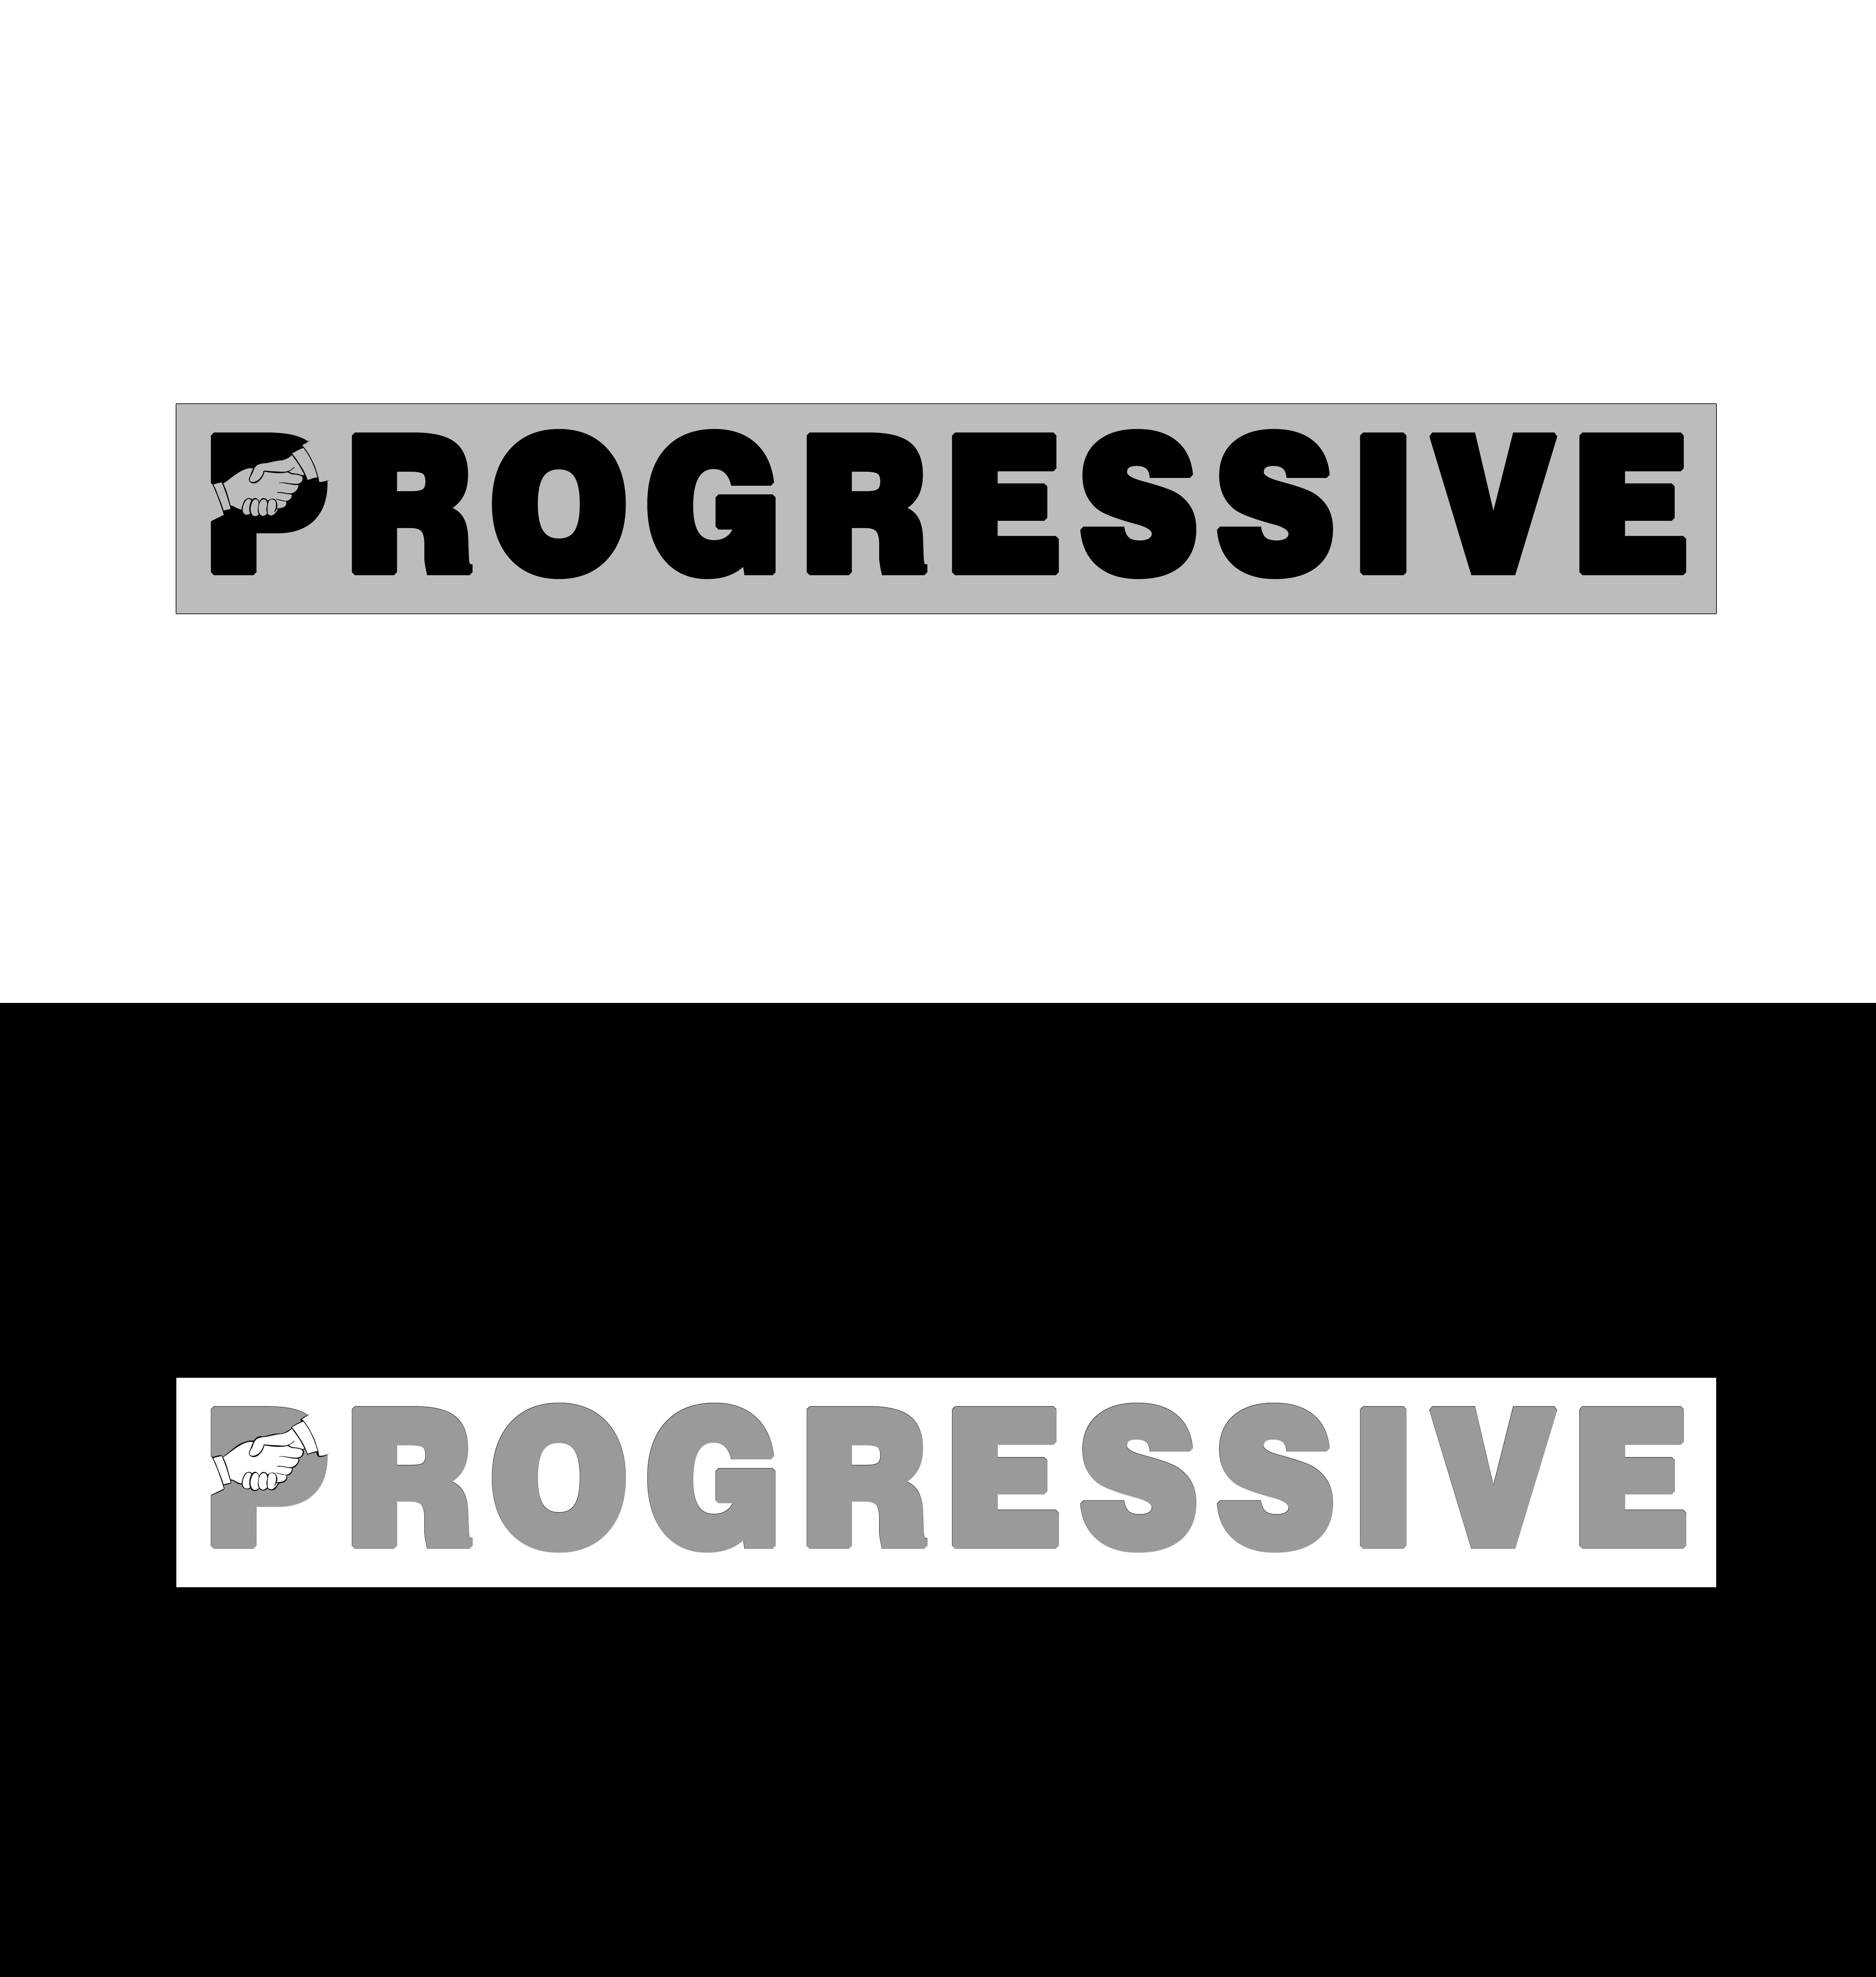 Logo Design by JSDESIGNGROUP - Entry No. 159 in the Logo Design Contest Captivating Logo Design for Progressive Business.